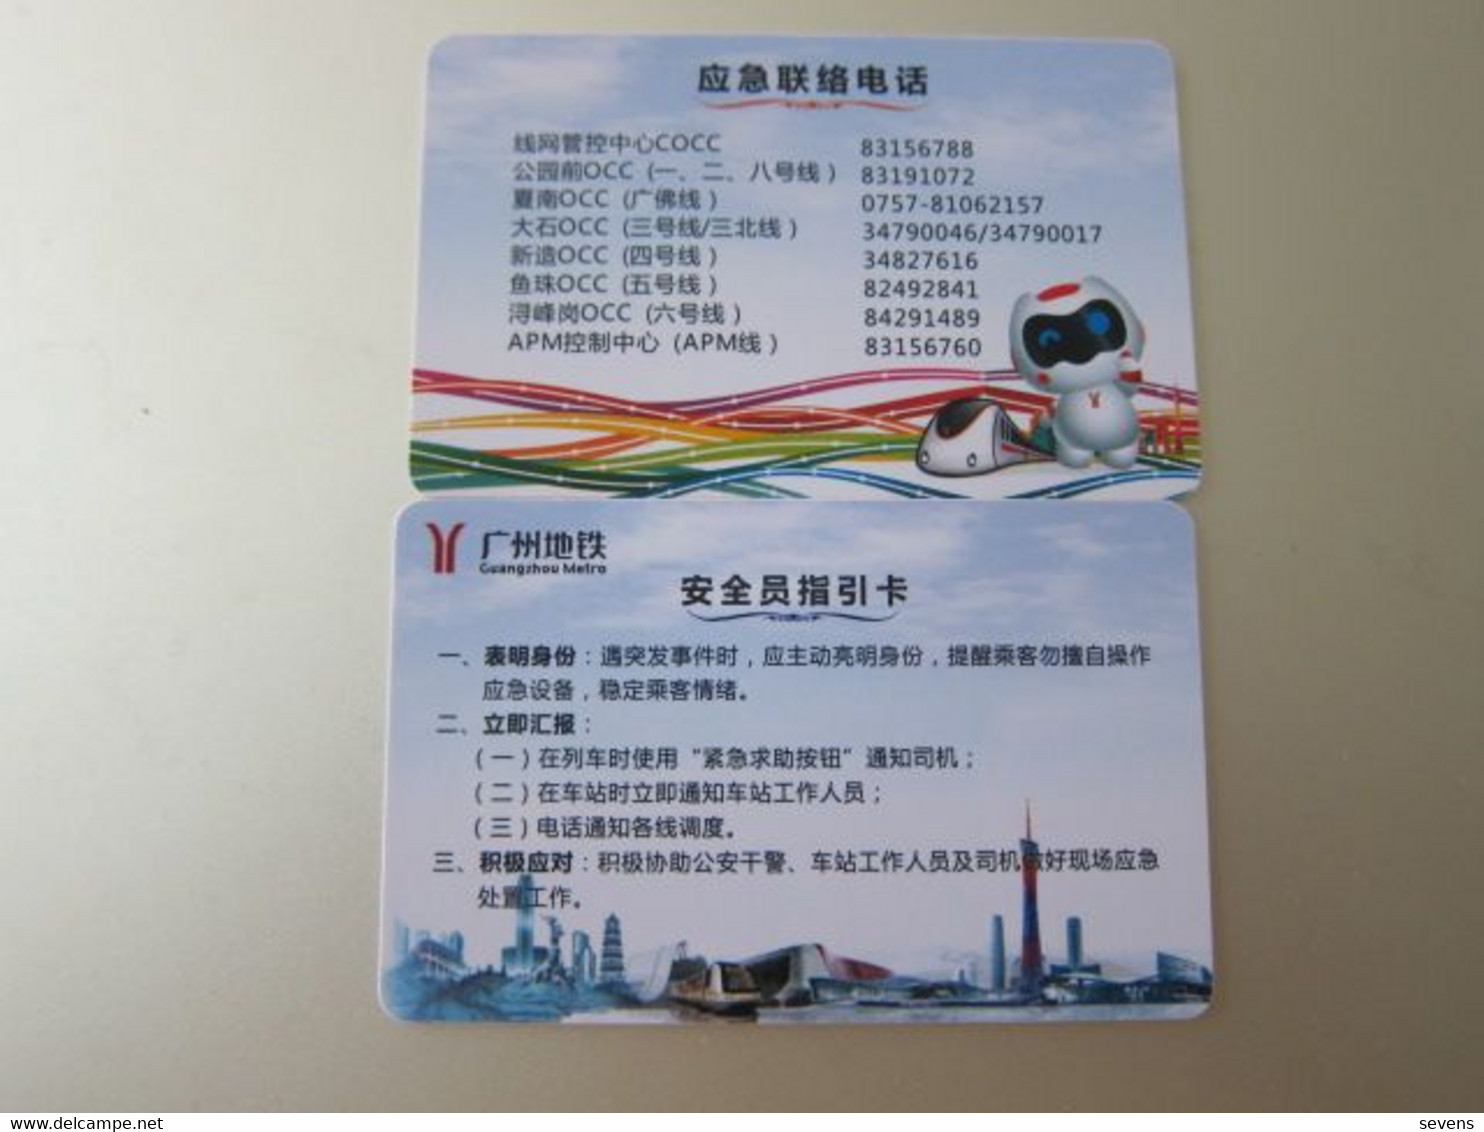 Guangzhou Metro Emergency Calls Advertisement Card,metro - Unclassified